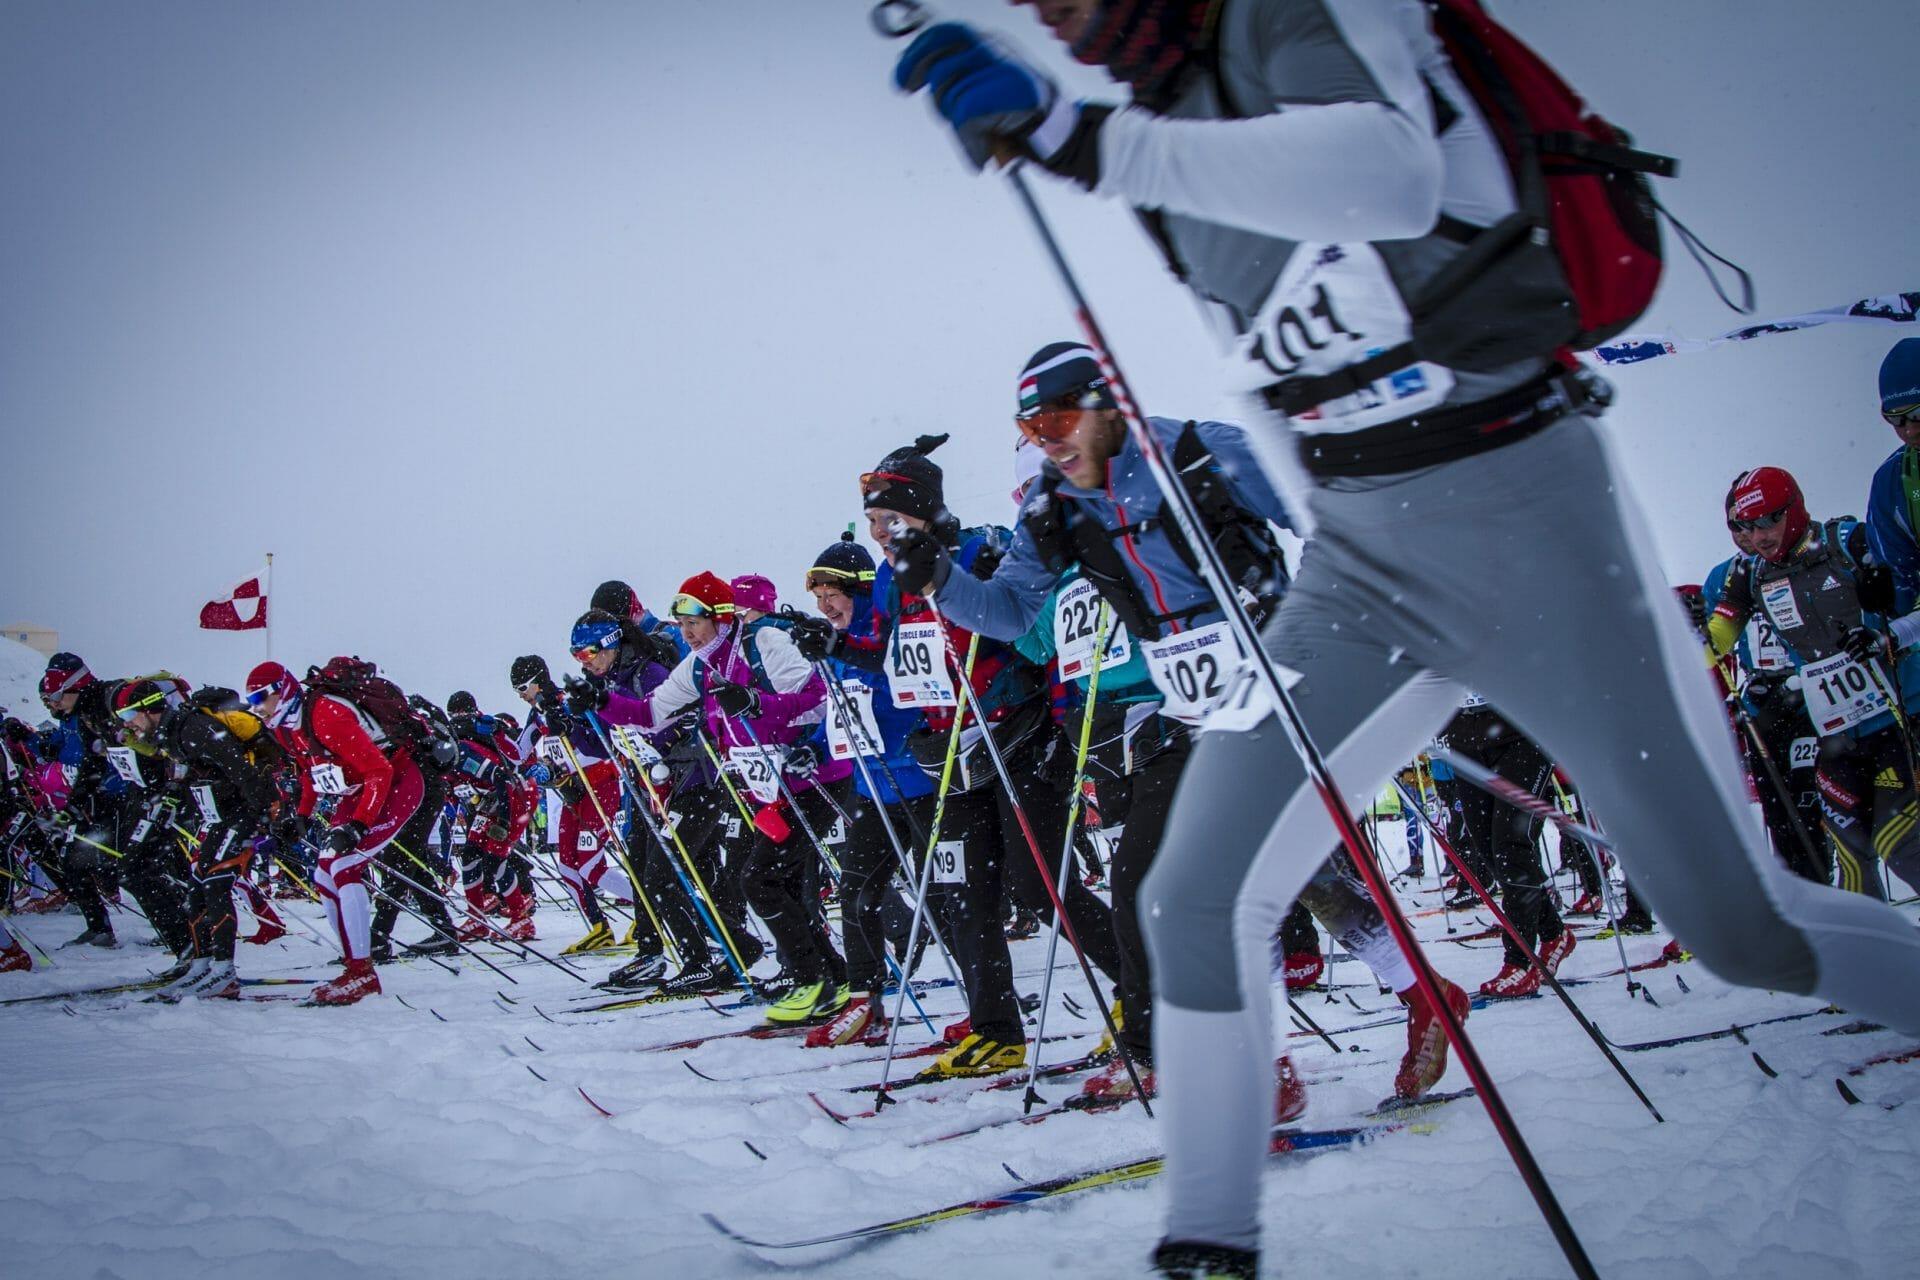 Arctic Circle Race Exploring the limits